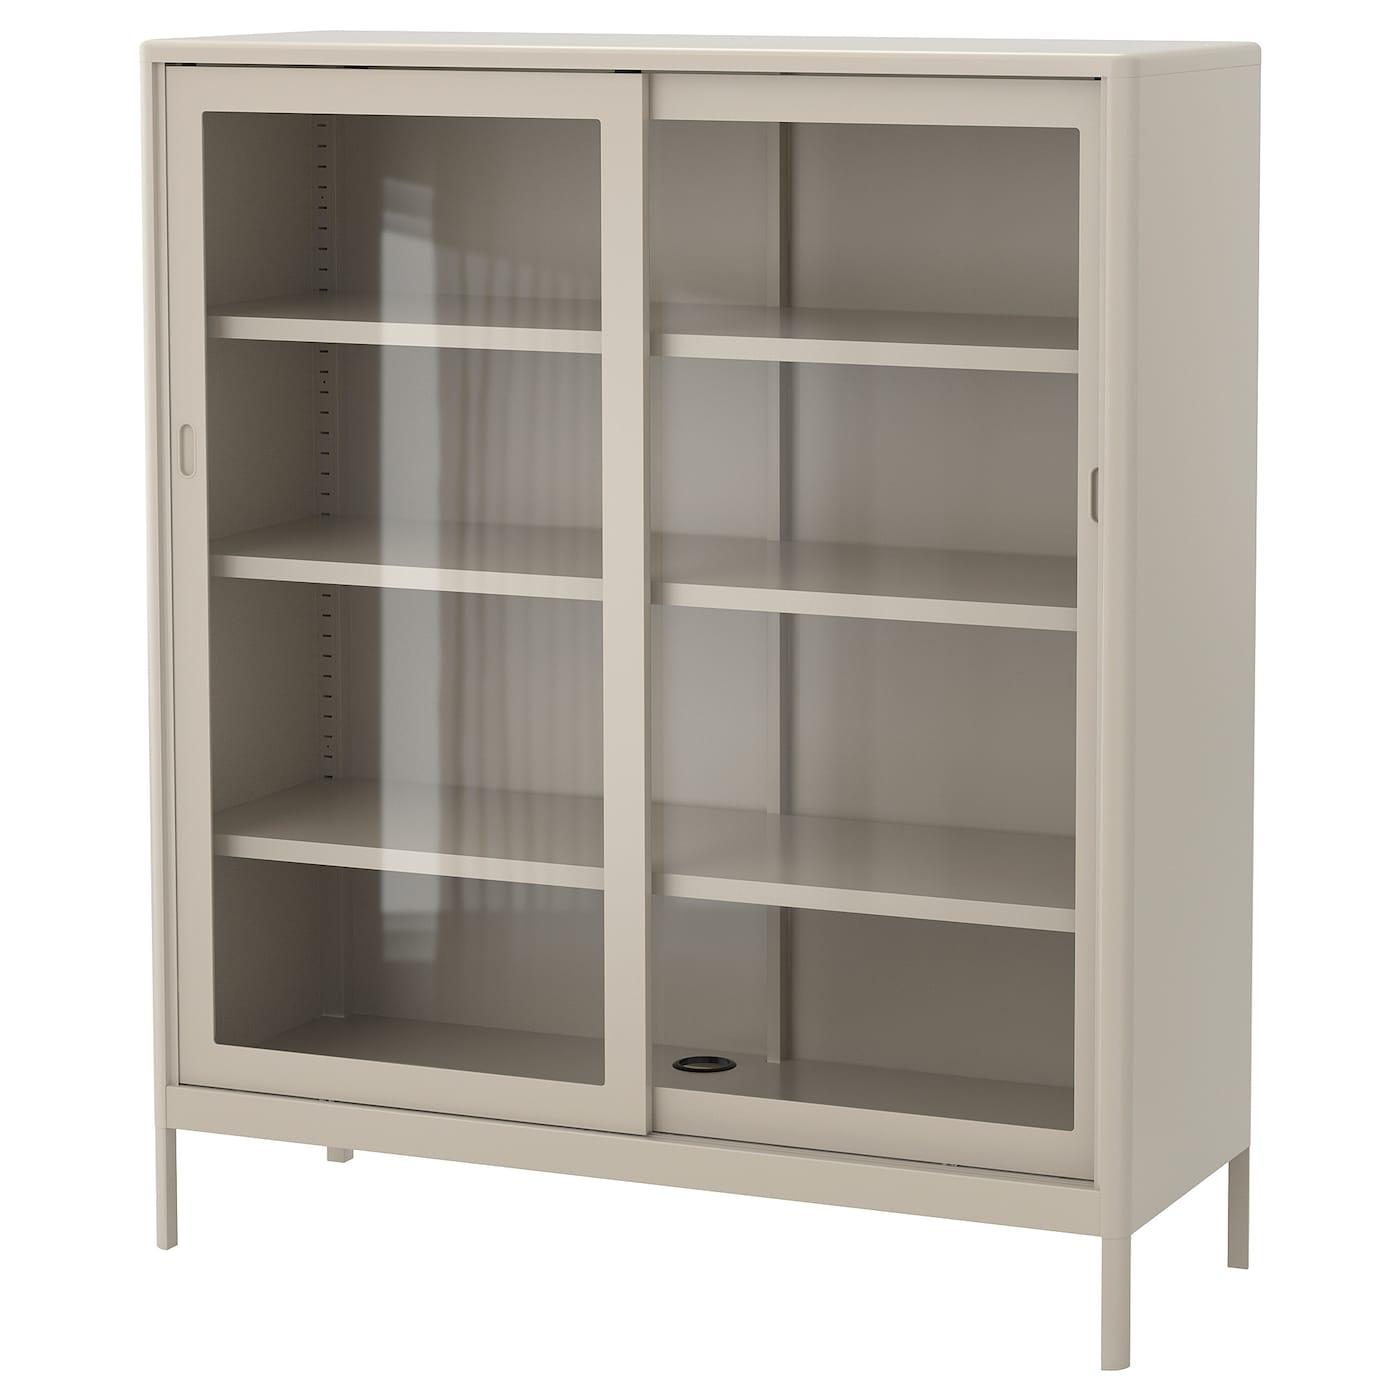 IDÅSEN Cabinet with sliding glass doors   beige 20x20 cm